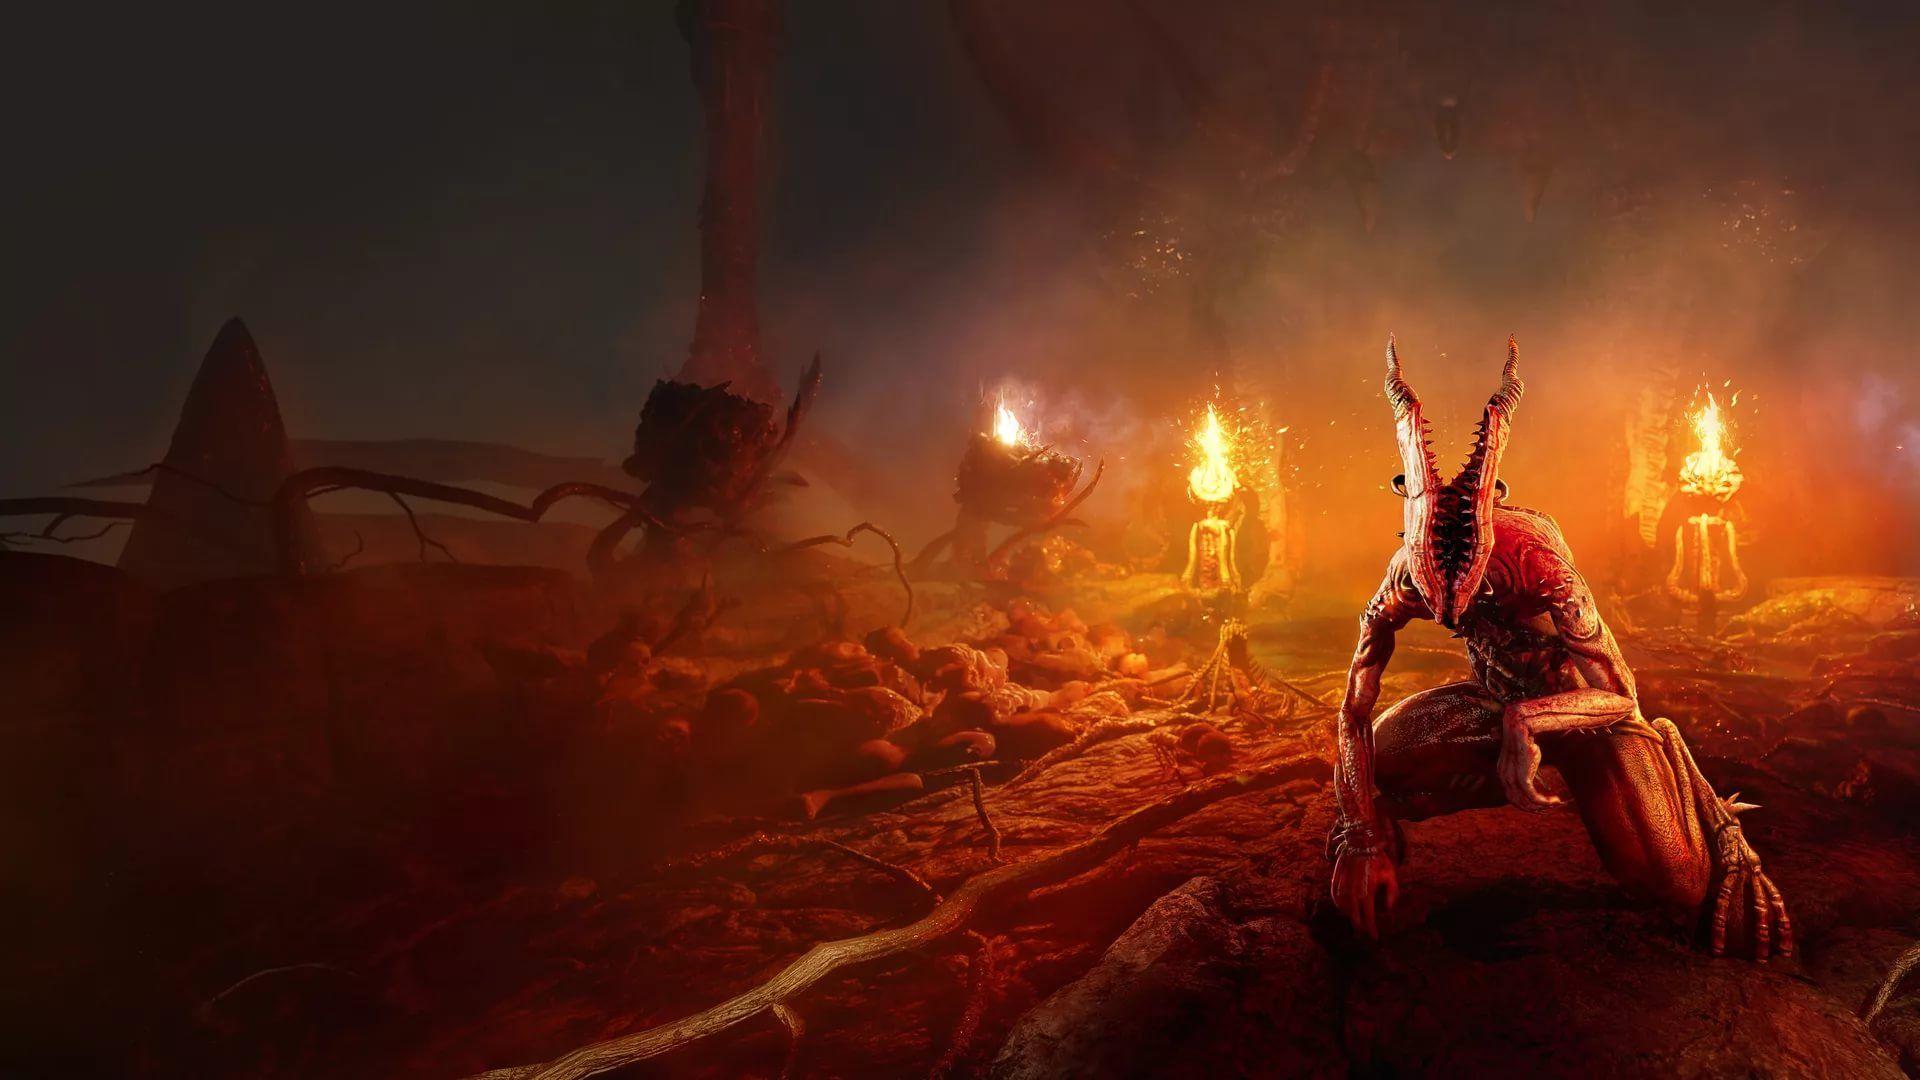 Hell Cool HD Wallpaper